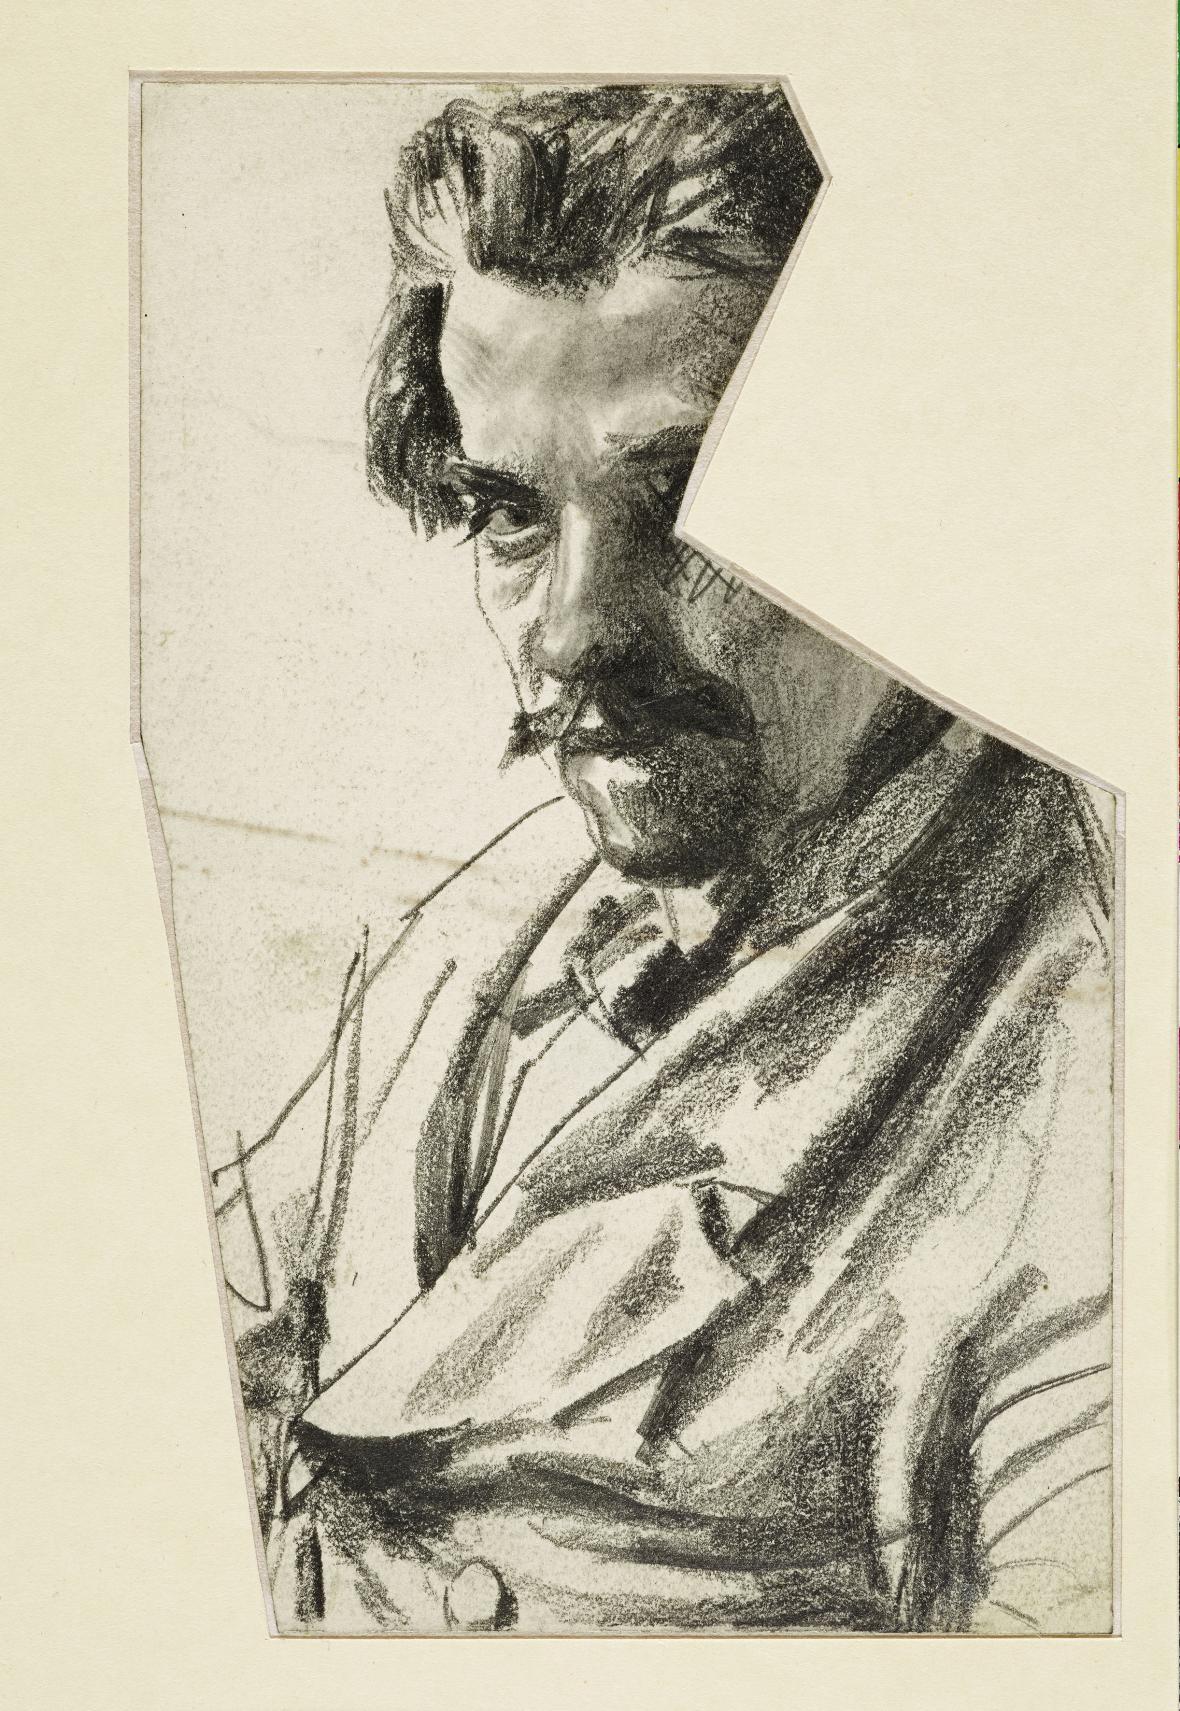 Adolph Menzel / Busta muže